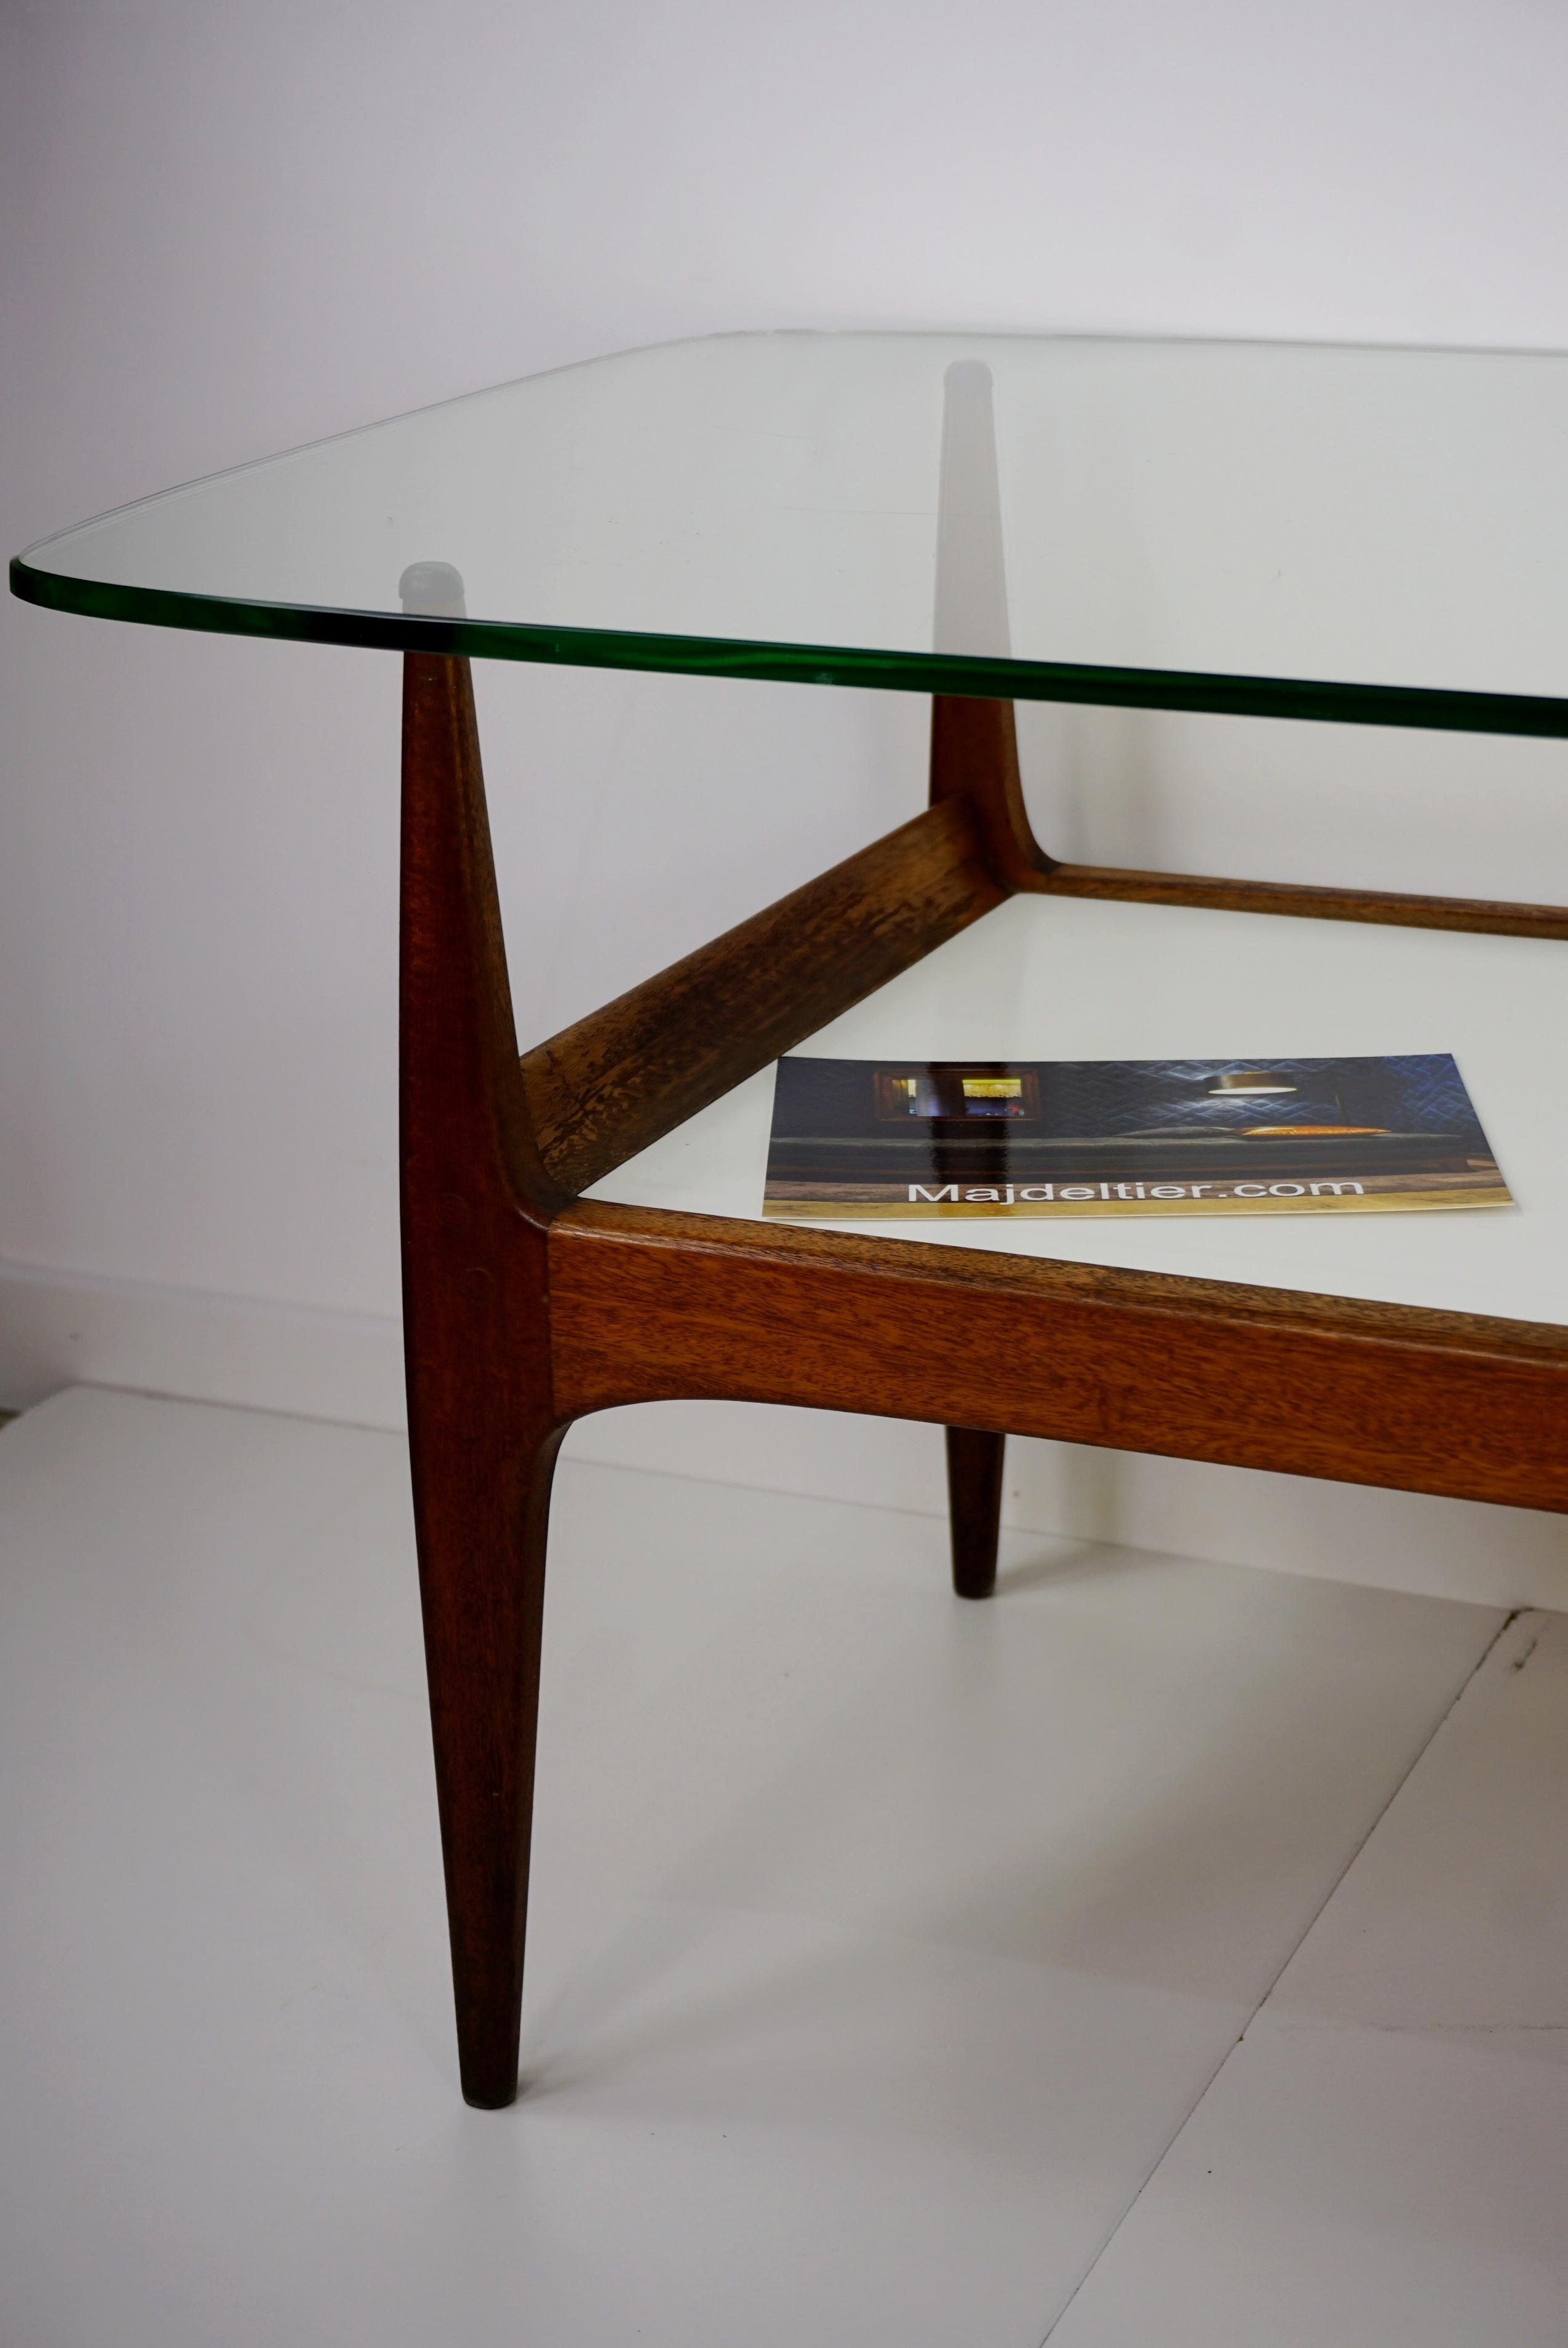 https://www.design-mkt.com/455977/vintage-coffee-table-by-jos-de-mey-1960s.jpg